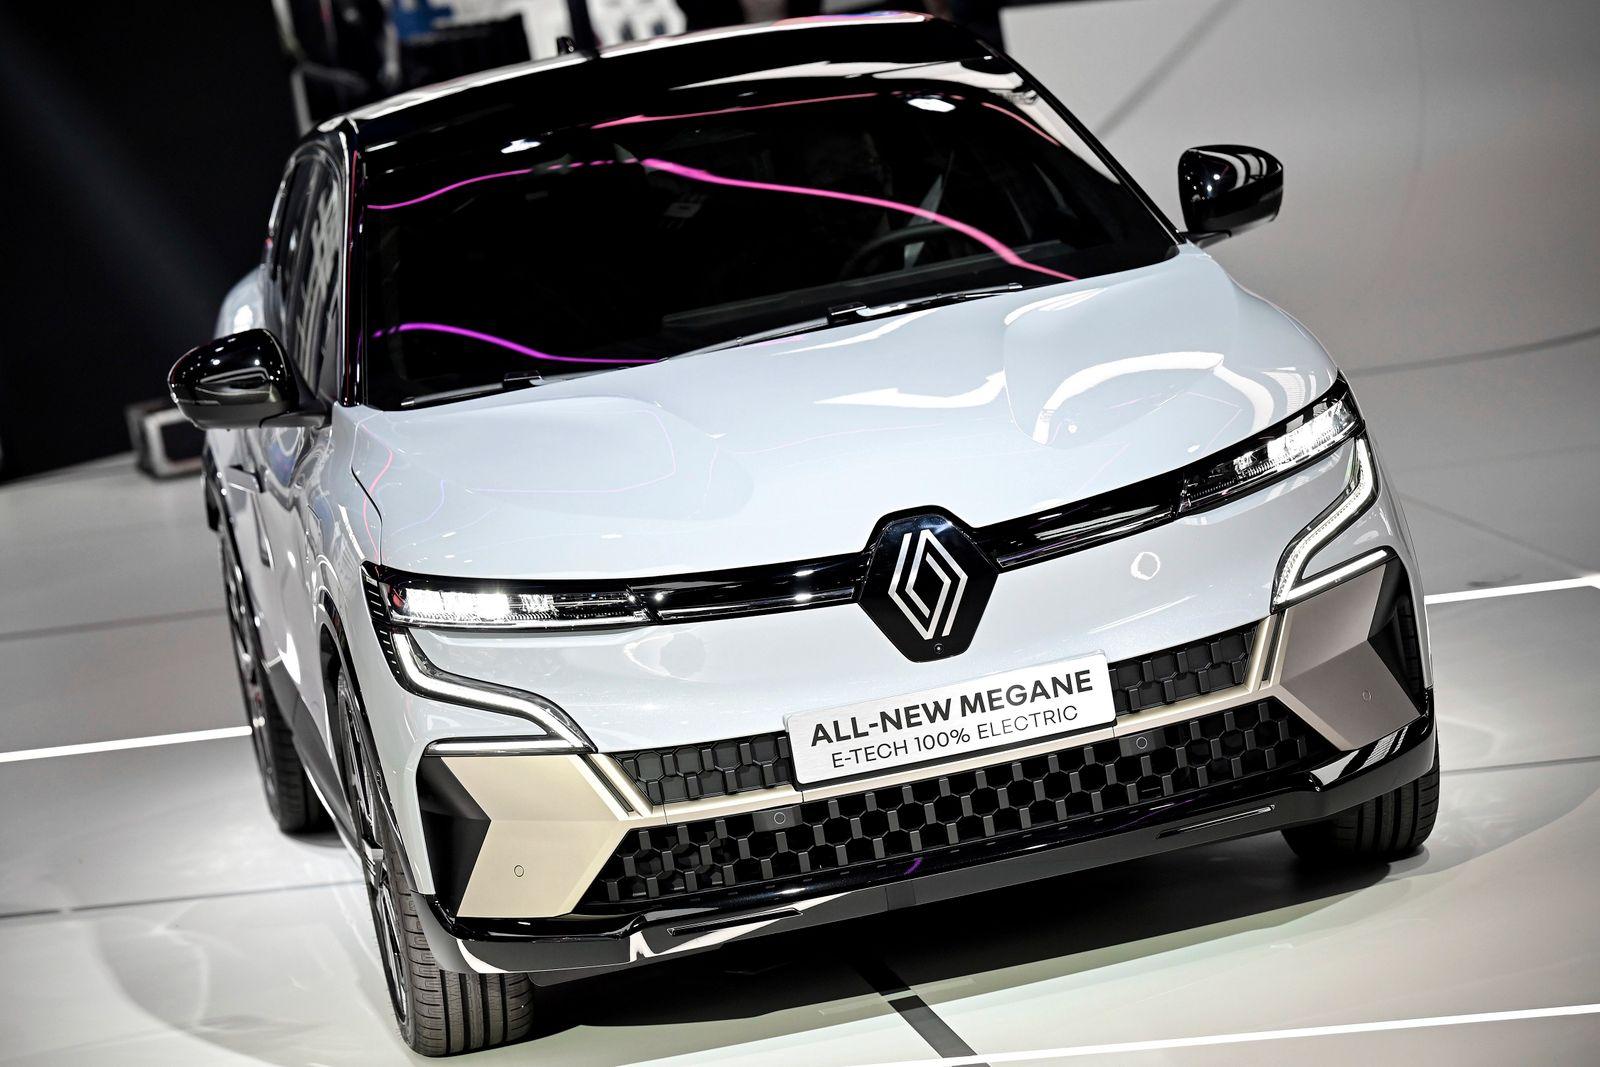 IAA Mobility 2021 - International Motor Show